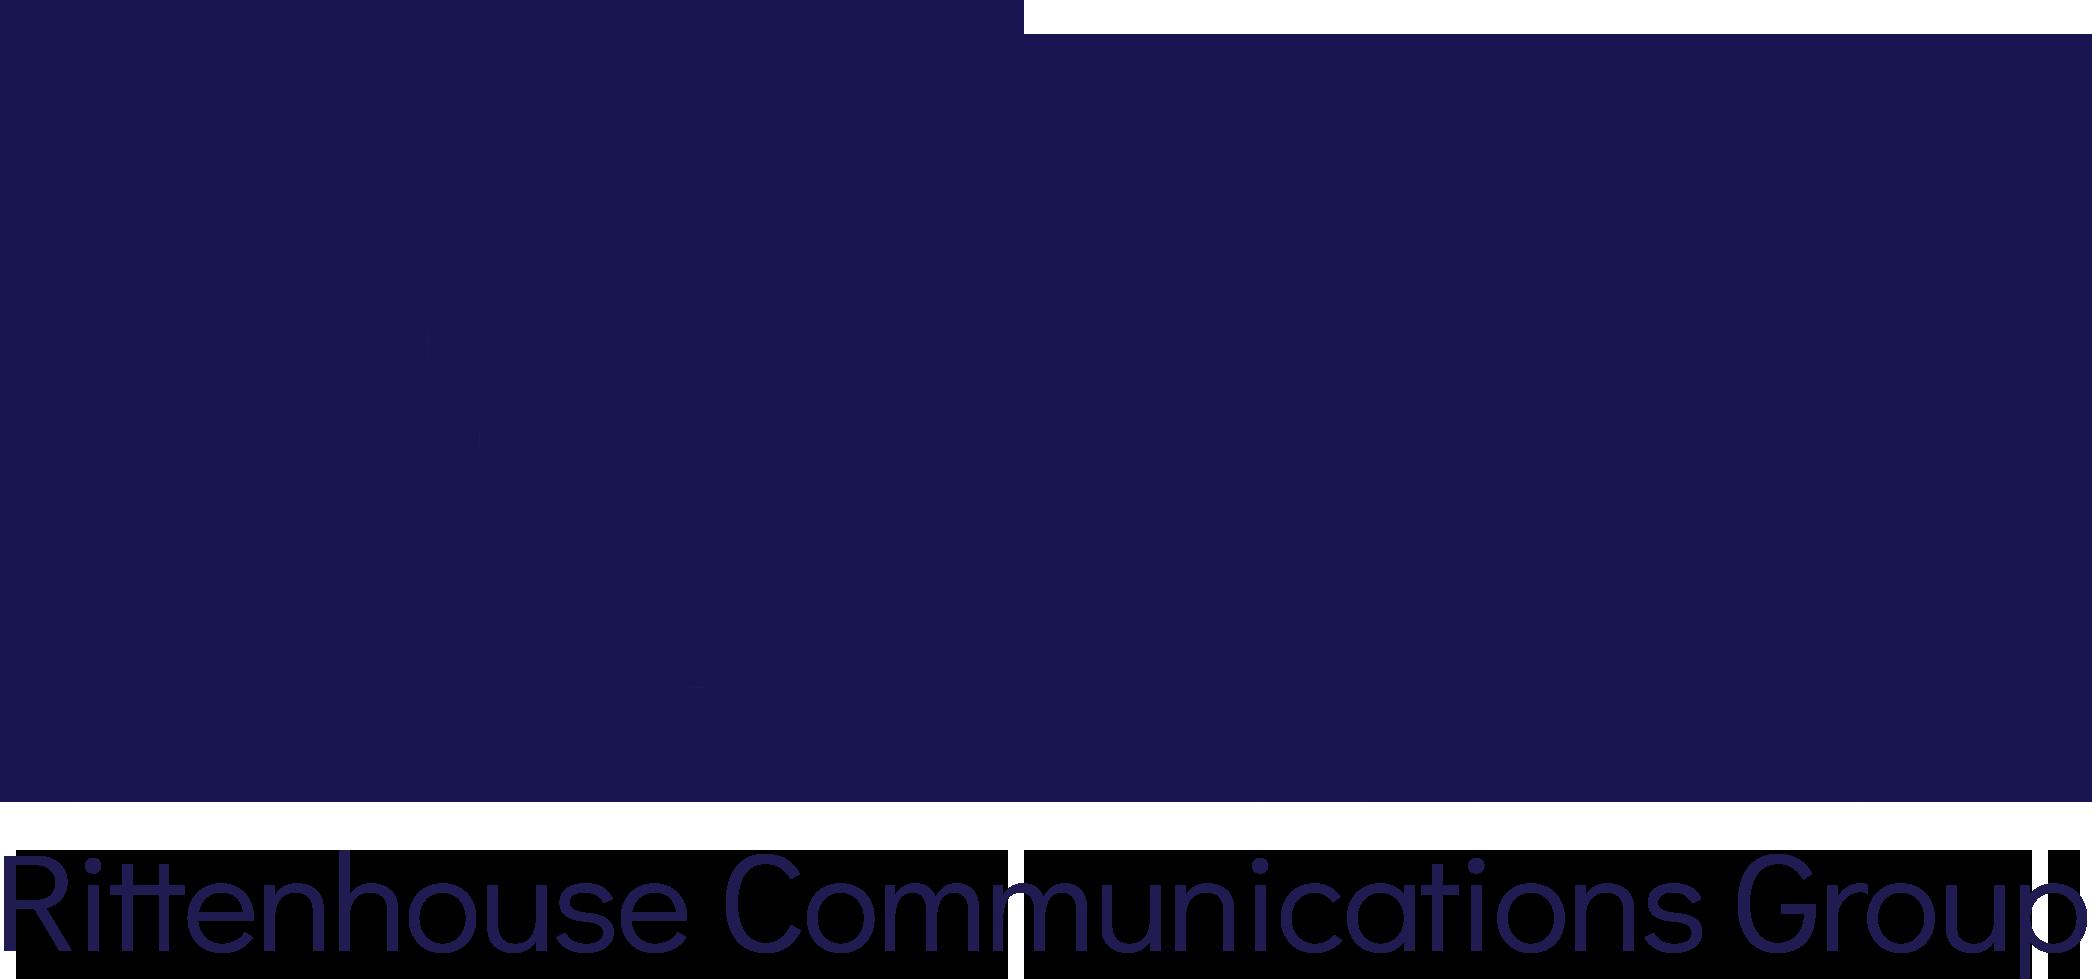 Rittenhouse Communications Group's